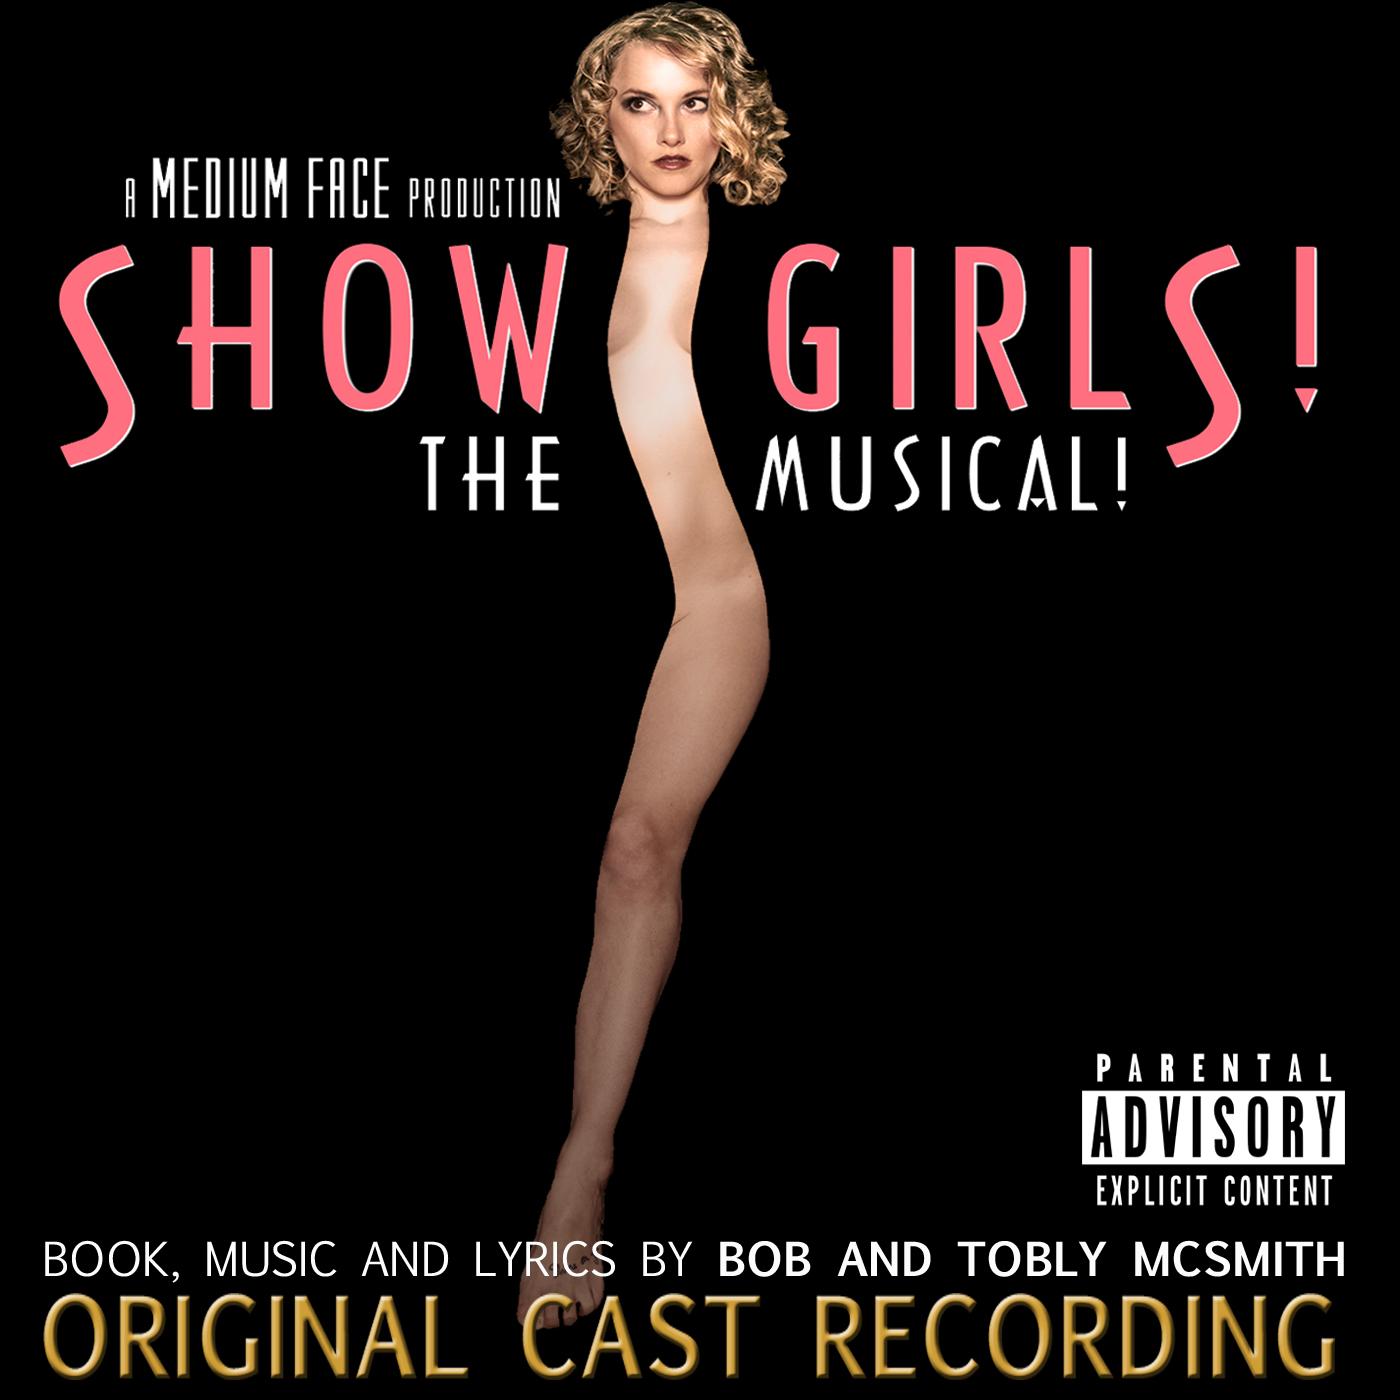 showgirls CD front.jpg